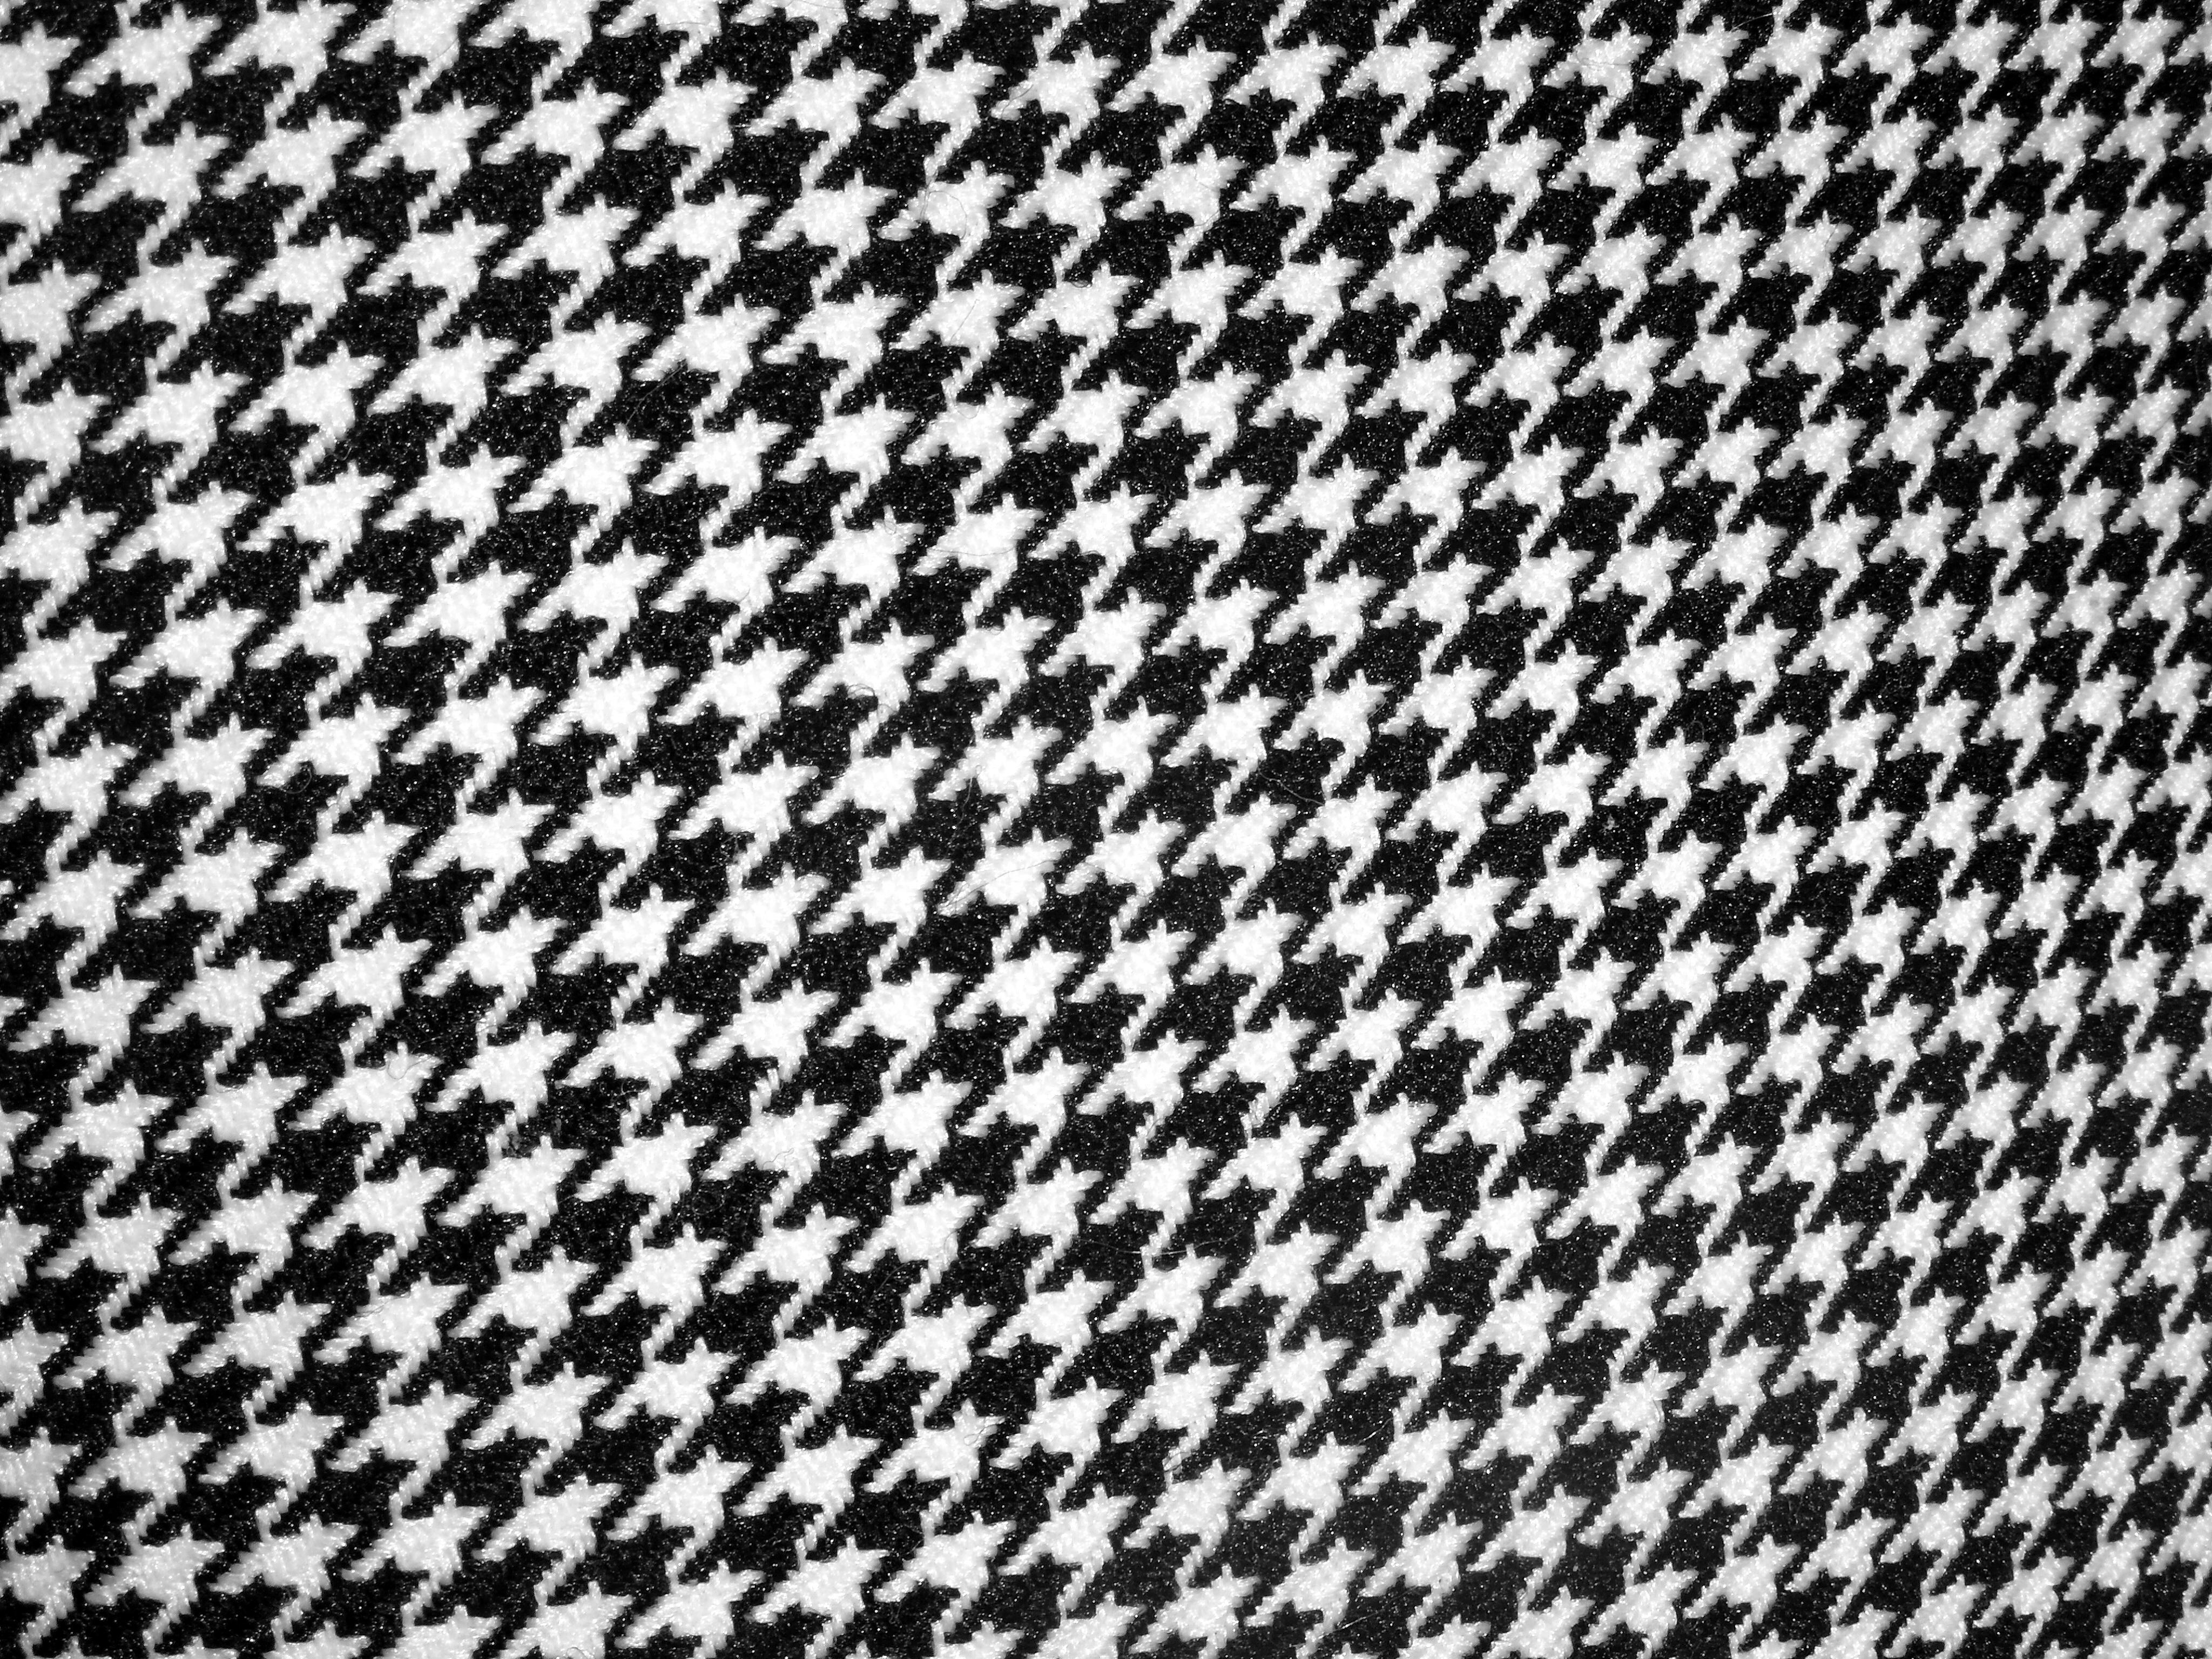 Seamless black and white pattern photo